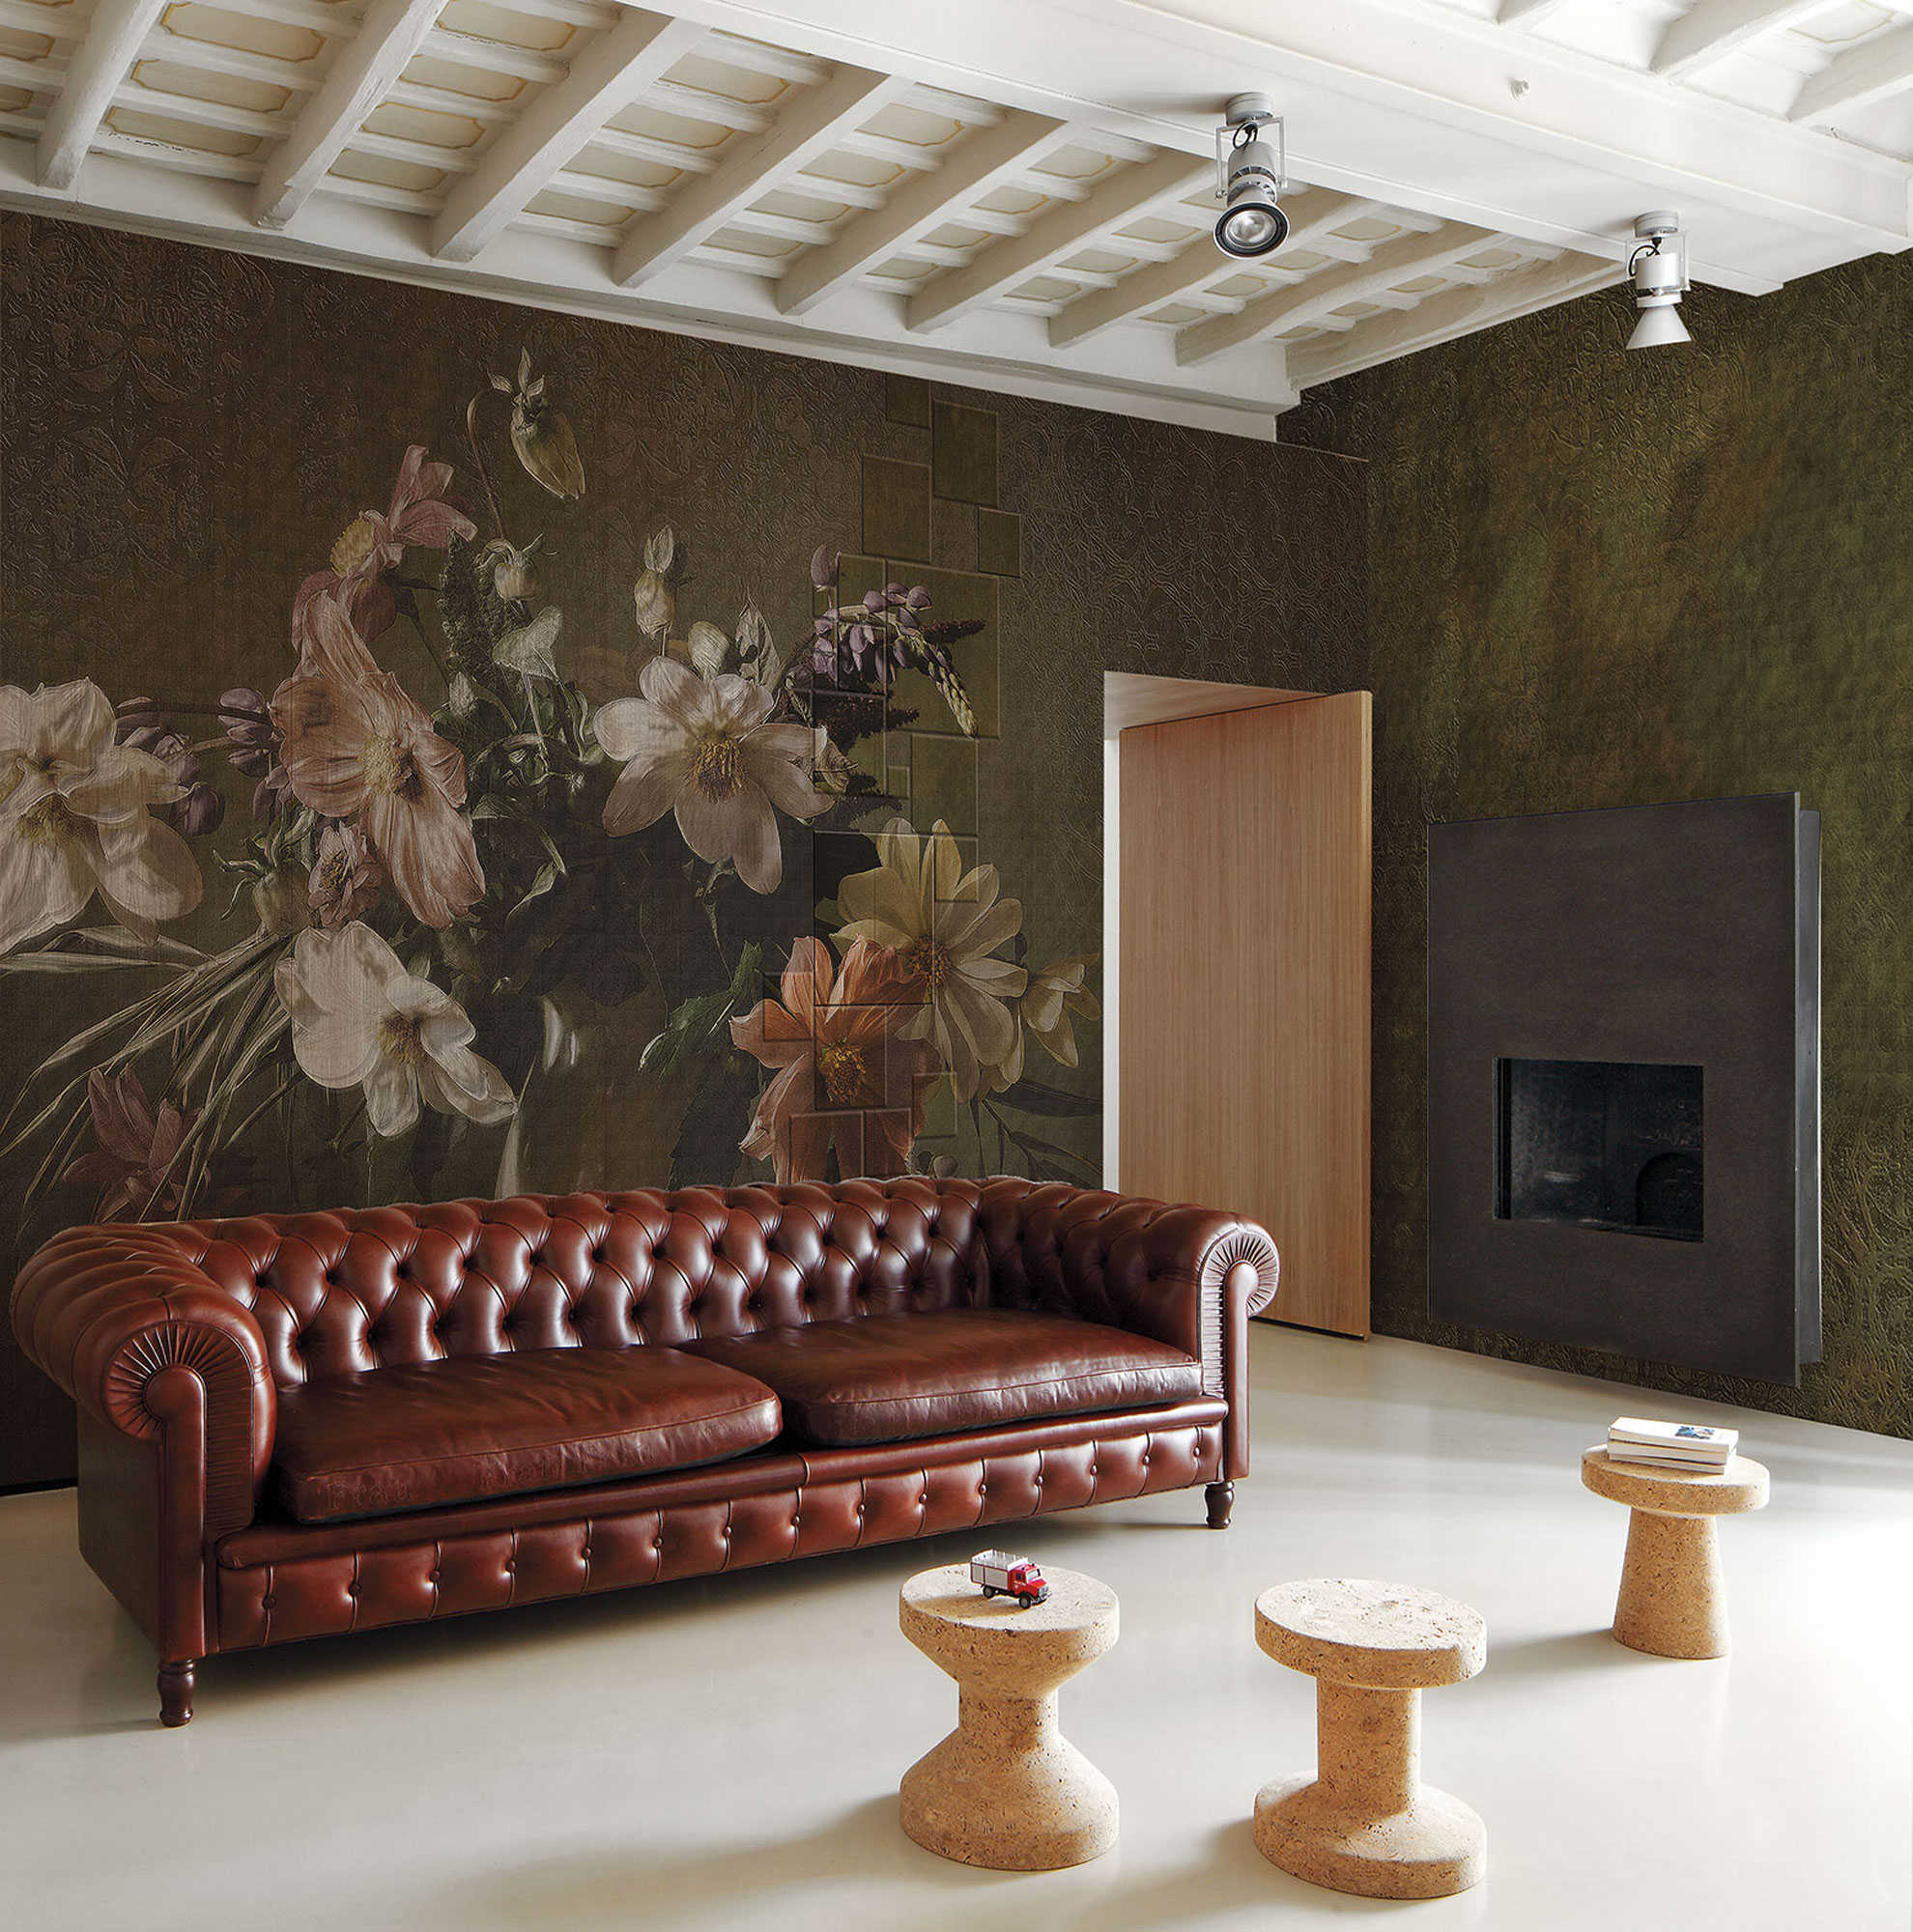 Stunning Salvarani Cucine Prezzi Photos - Home Ideas - tyger.us